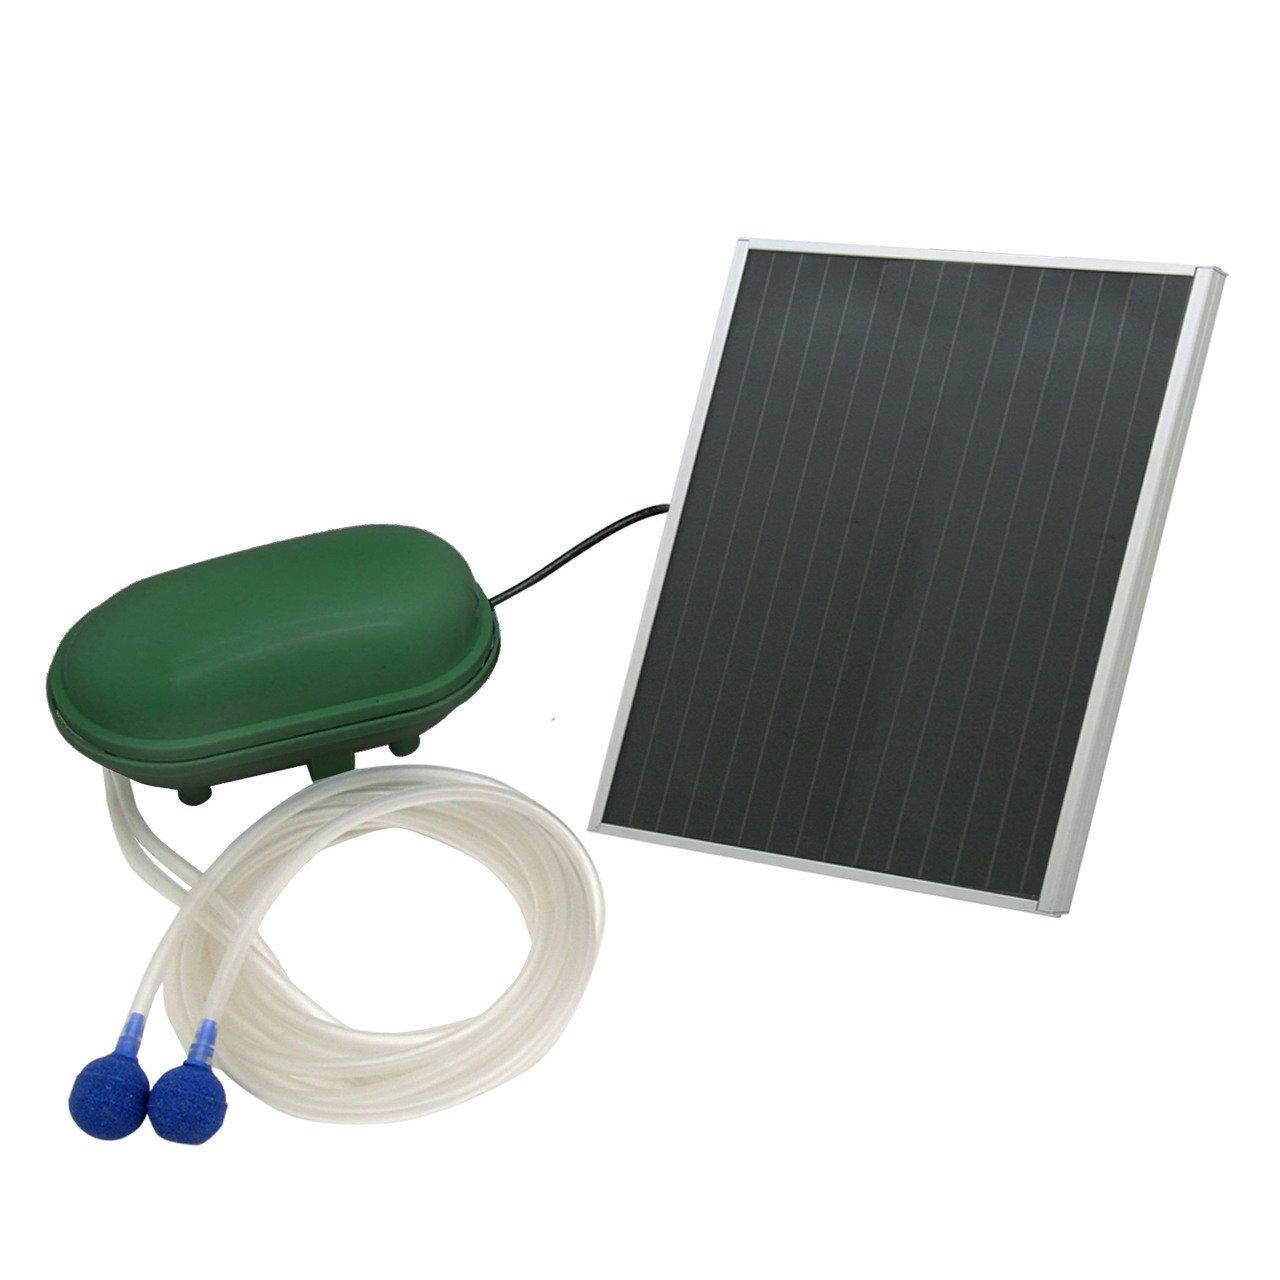 Sunnydaze Solar Oxygenator Air Pump